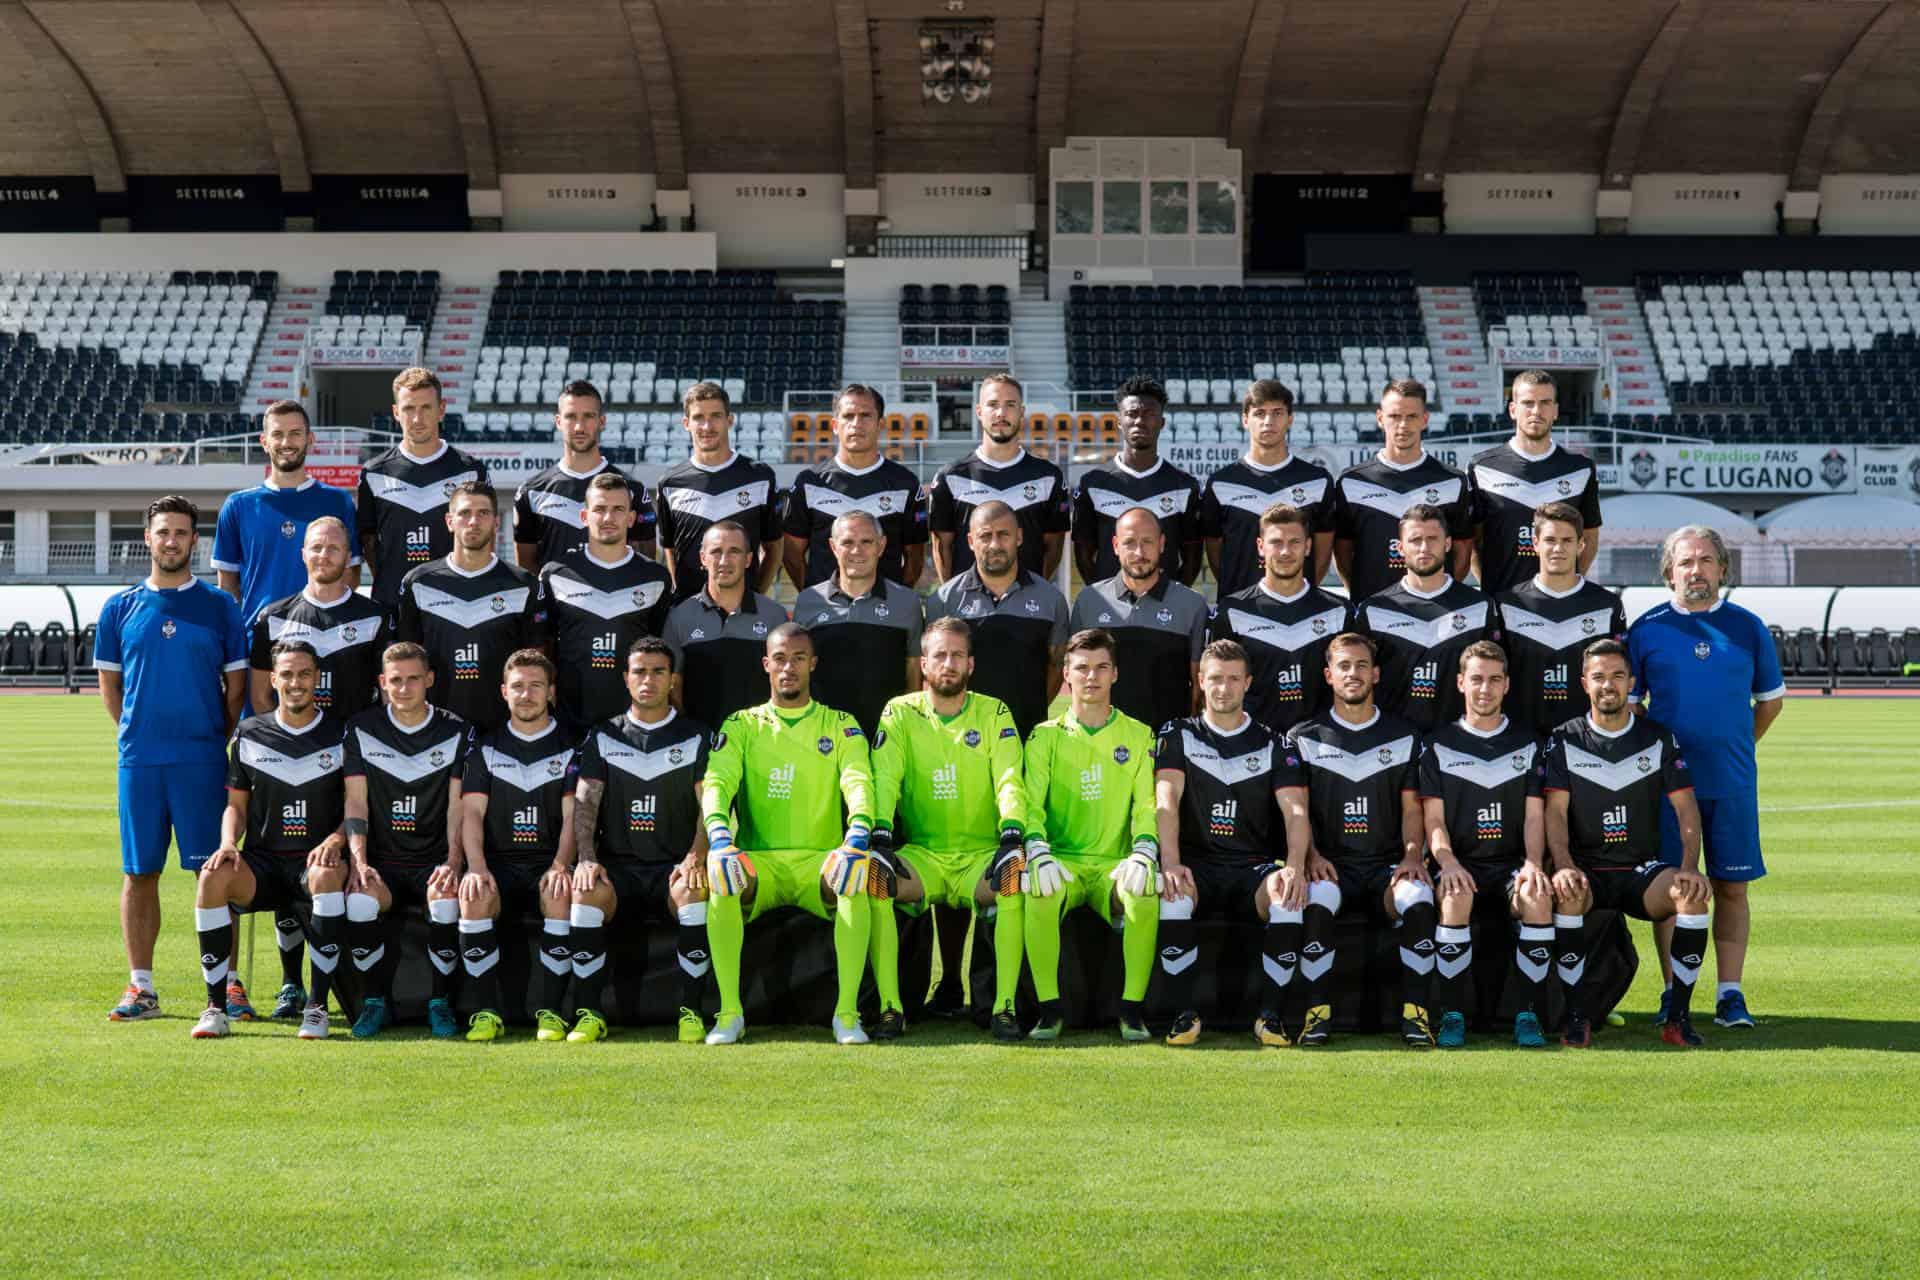 La squadra per la UEFA Europa League